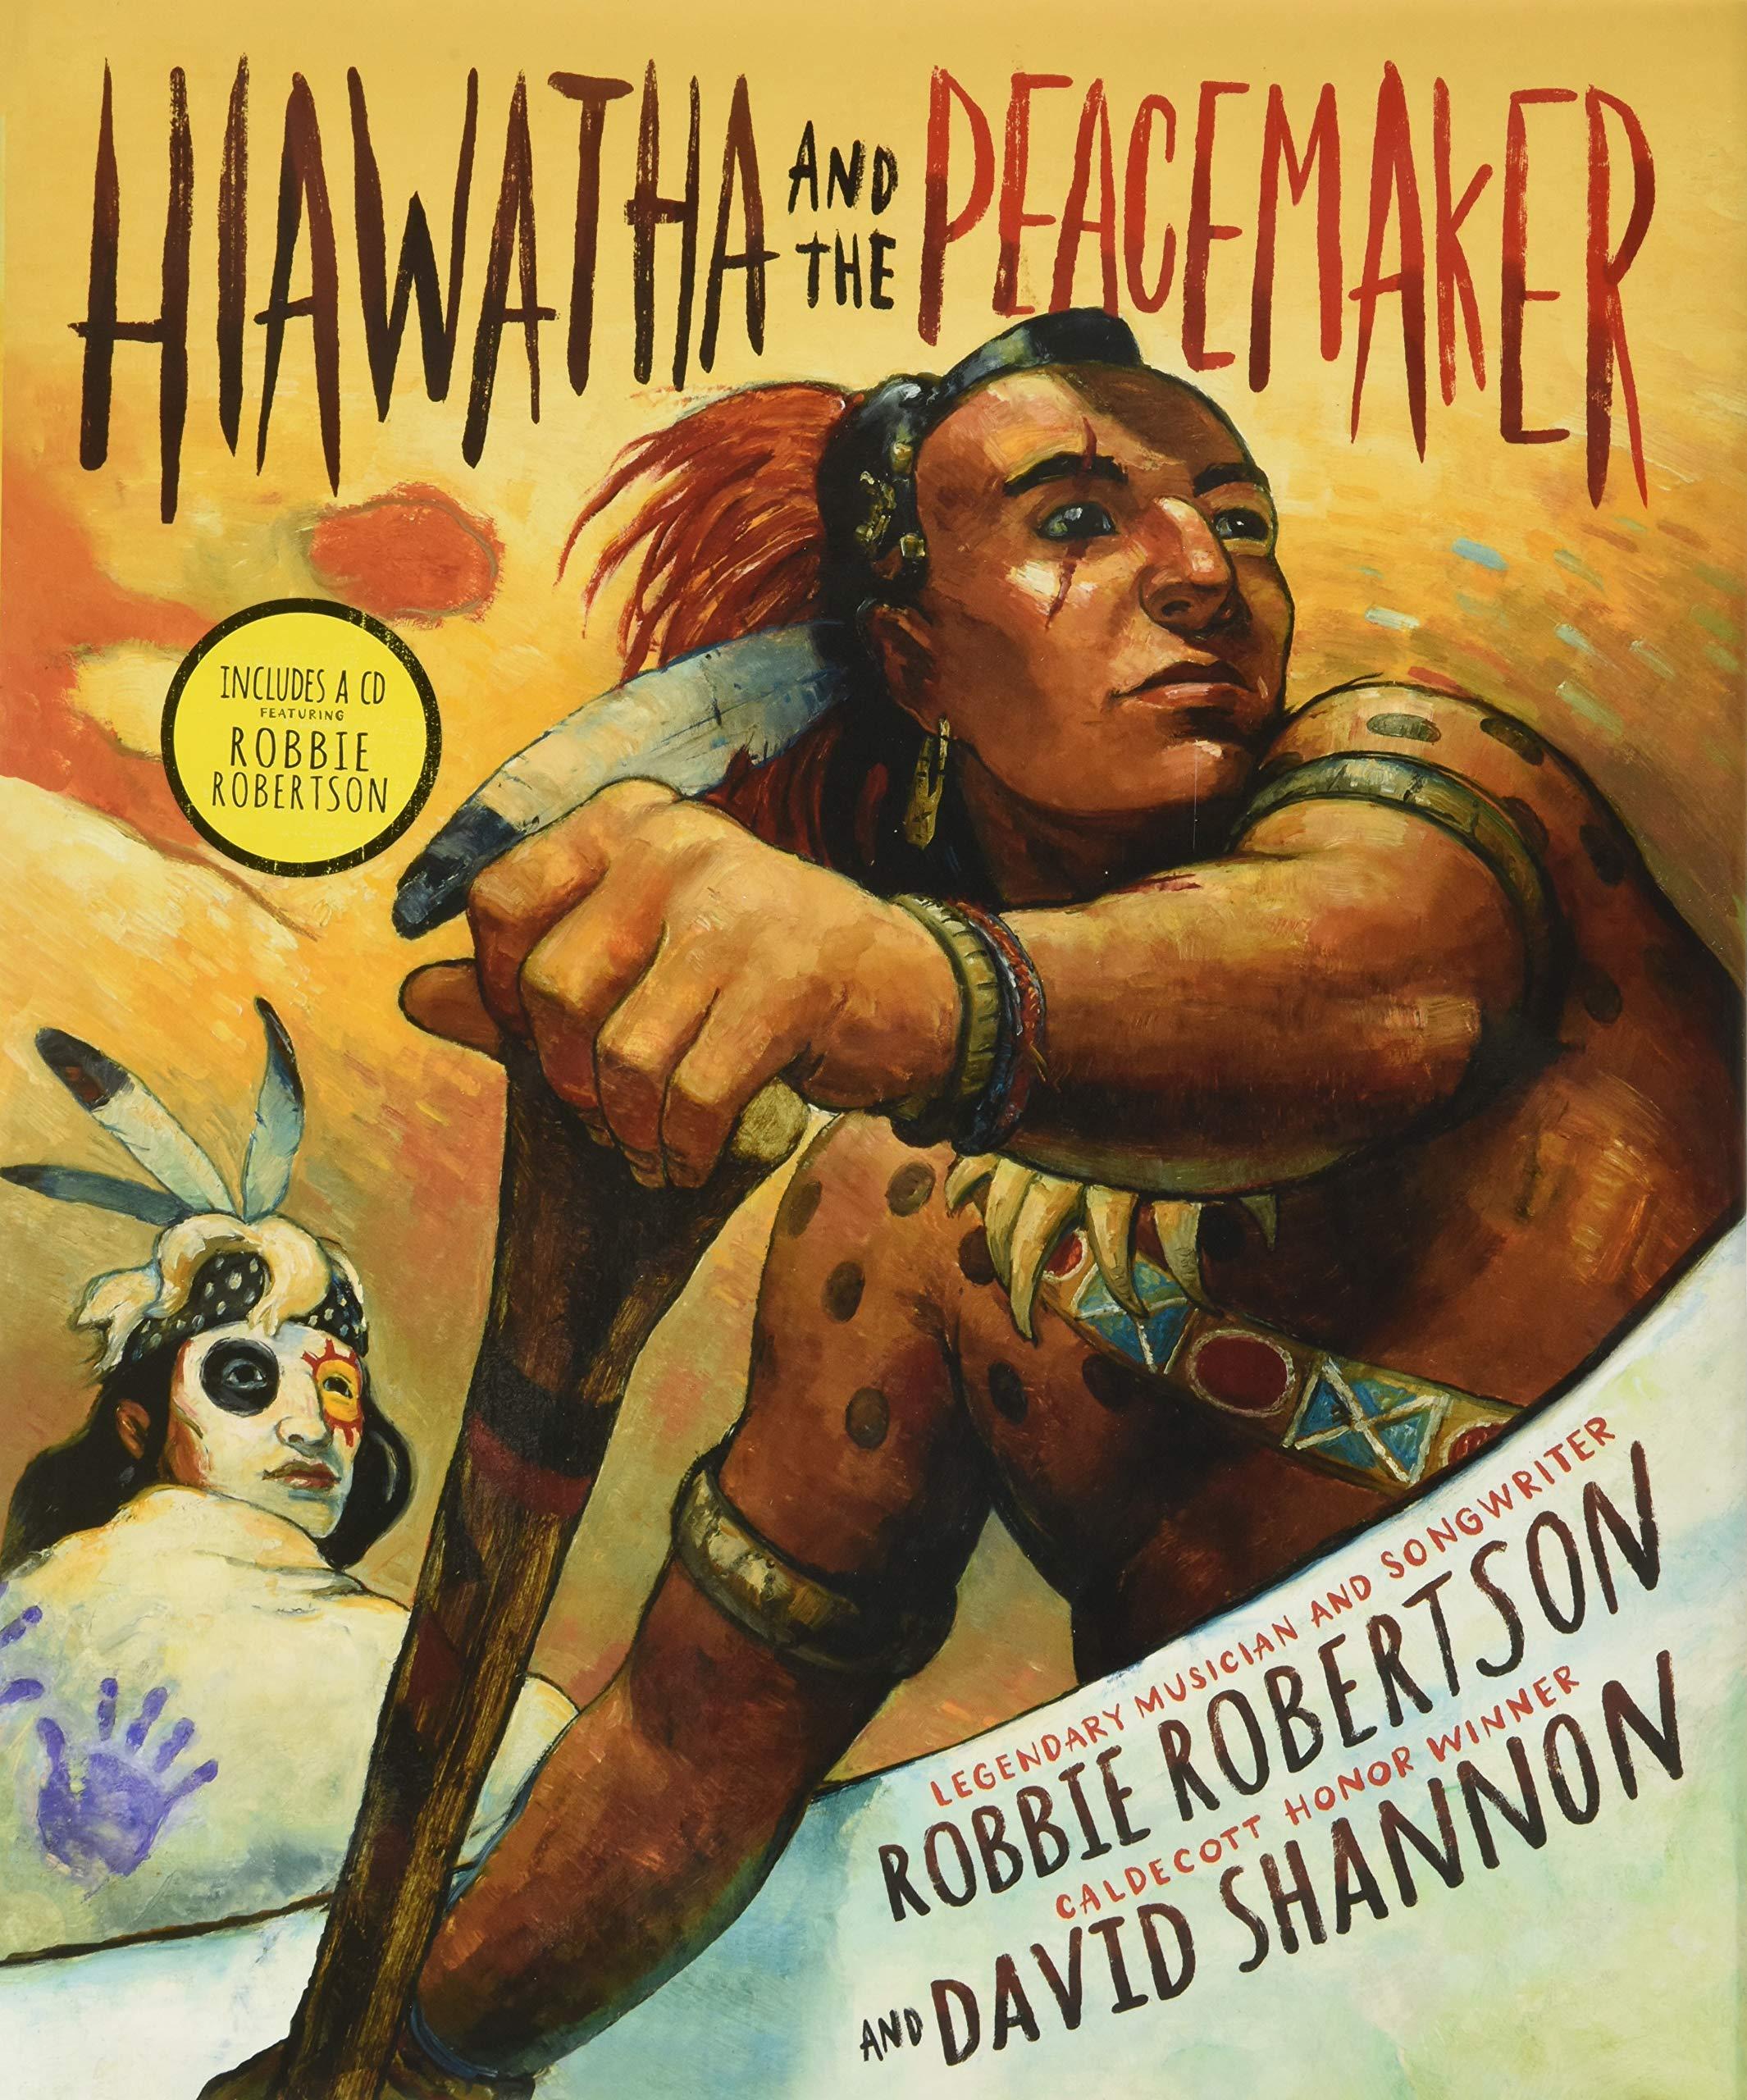 Hiawatha and the Peacemaker: Robertson, Robbie, Shannon, David:  9781419712203: Amazon.com: Books